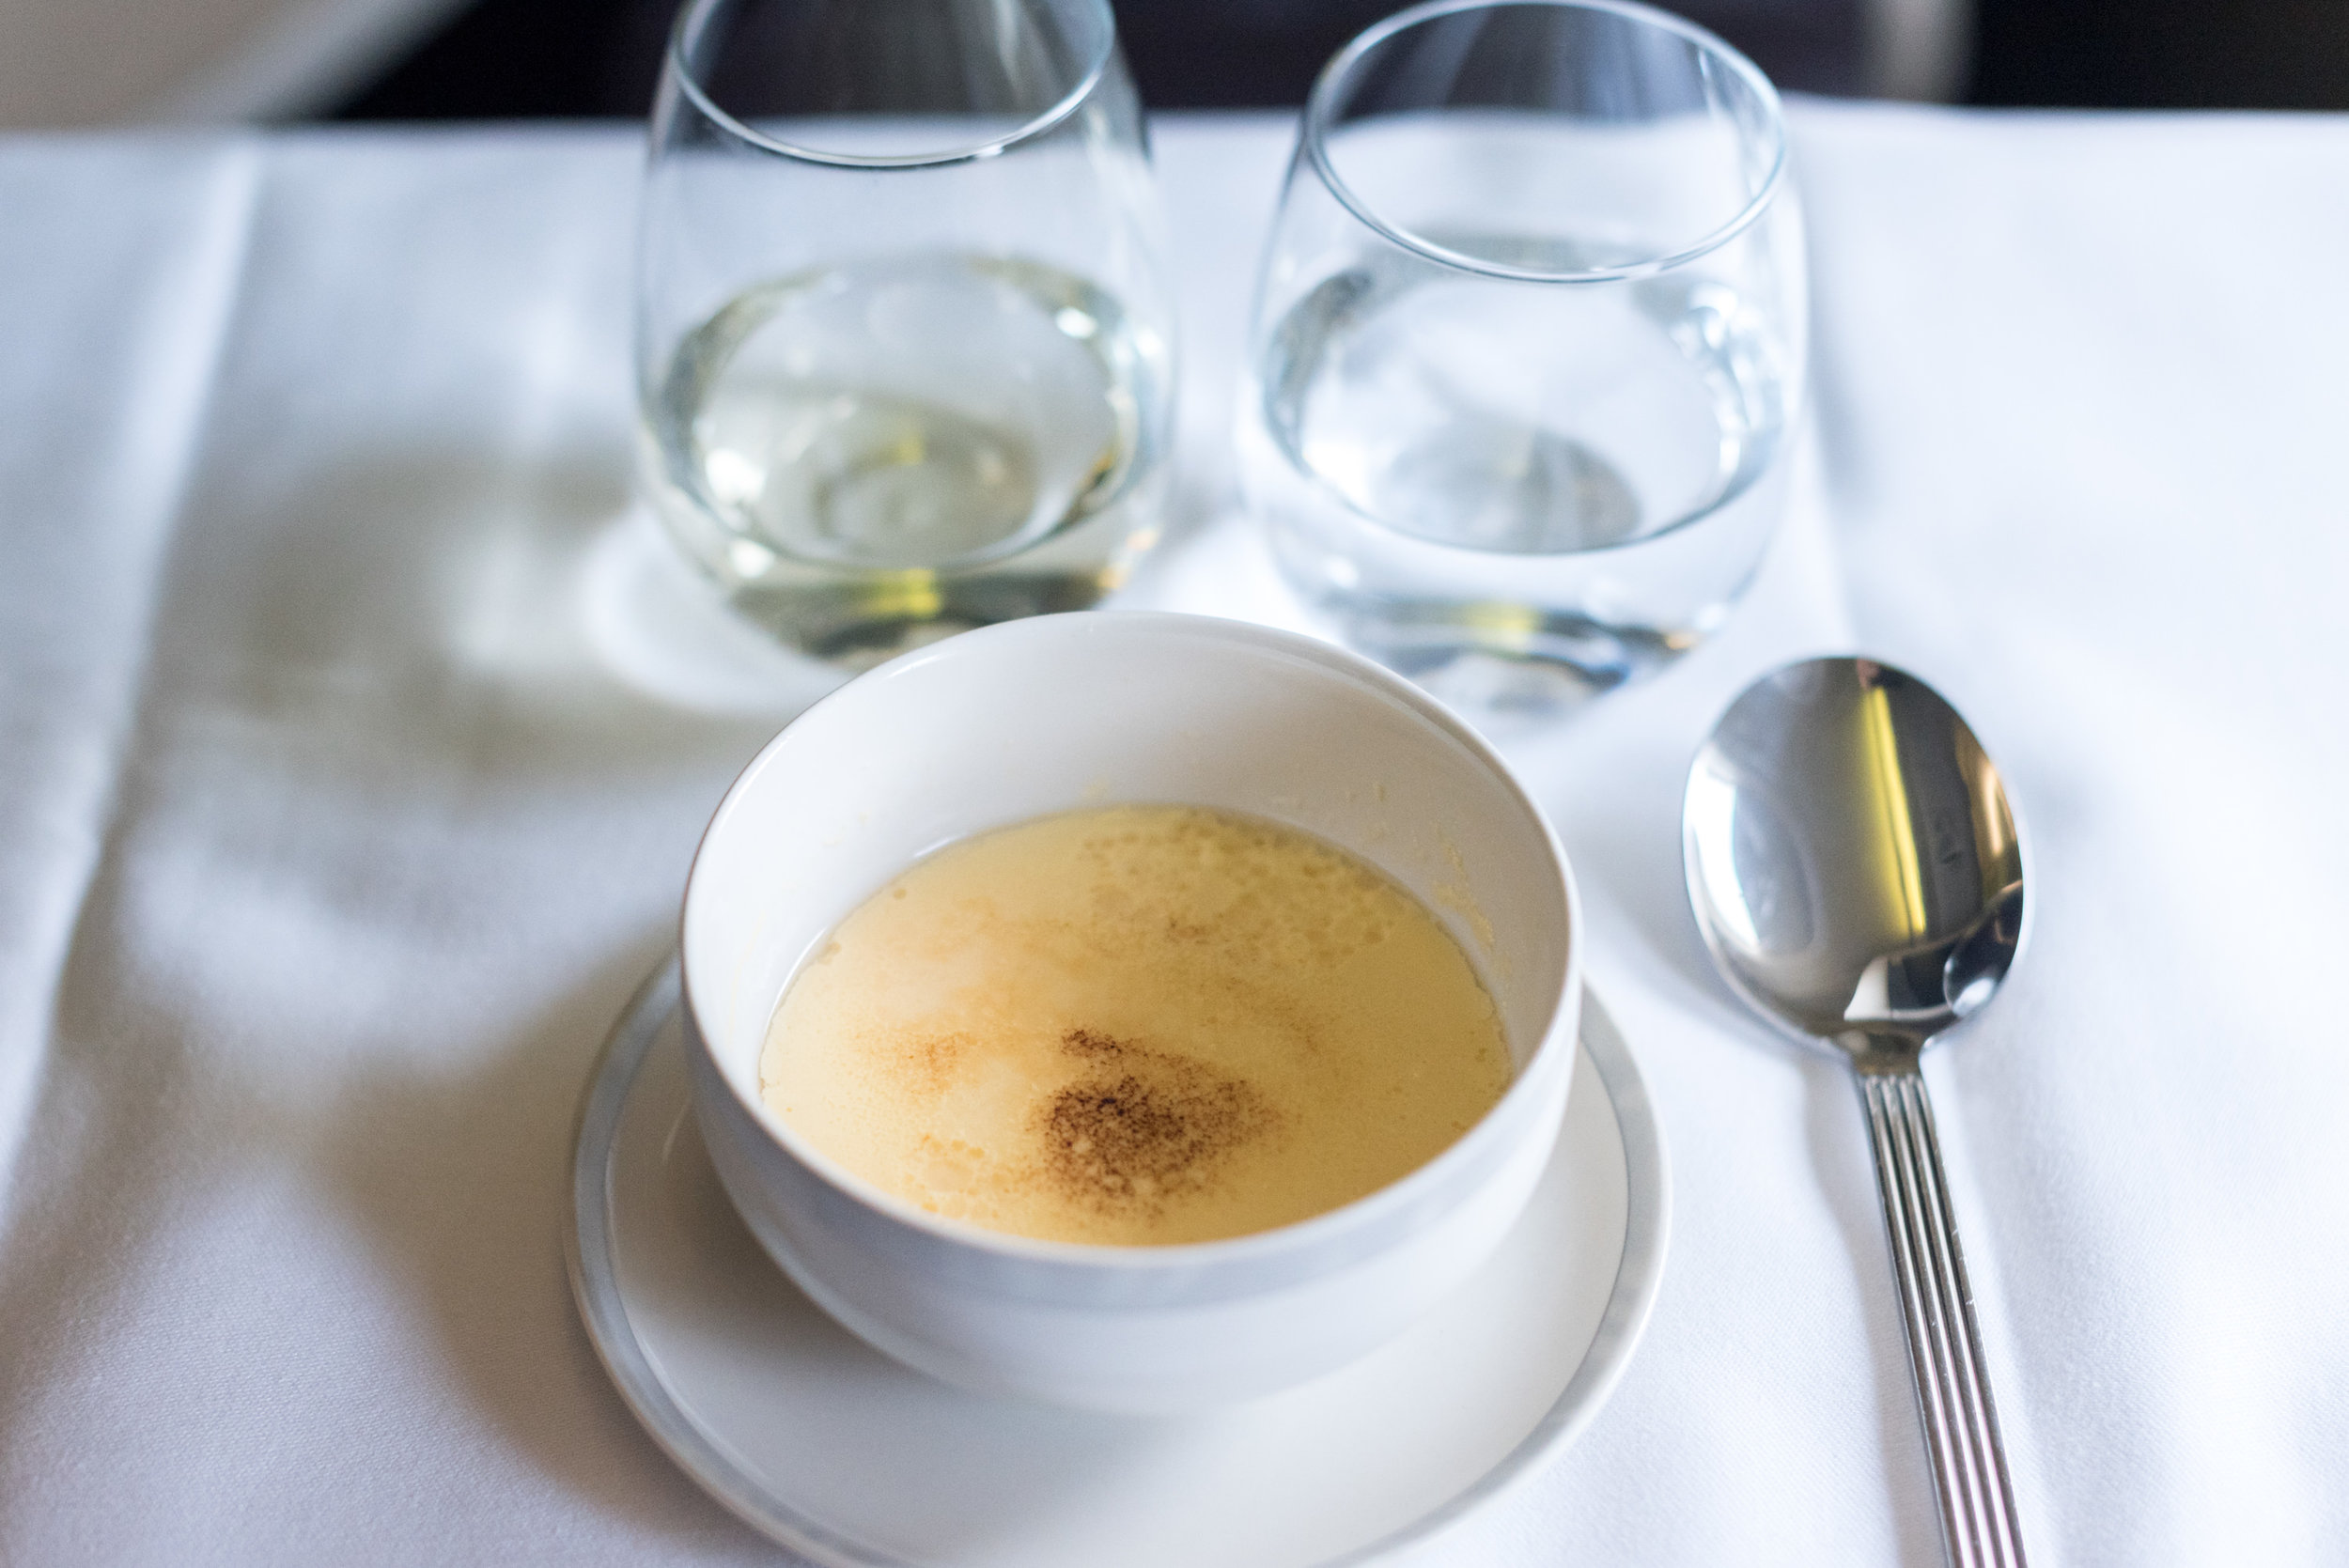 Crème Brûlée - Light Dinner Service  Singapore Airlines Business Class SQ286 A380-800 - AKL to SIN